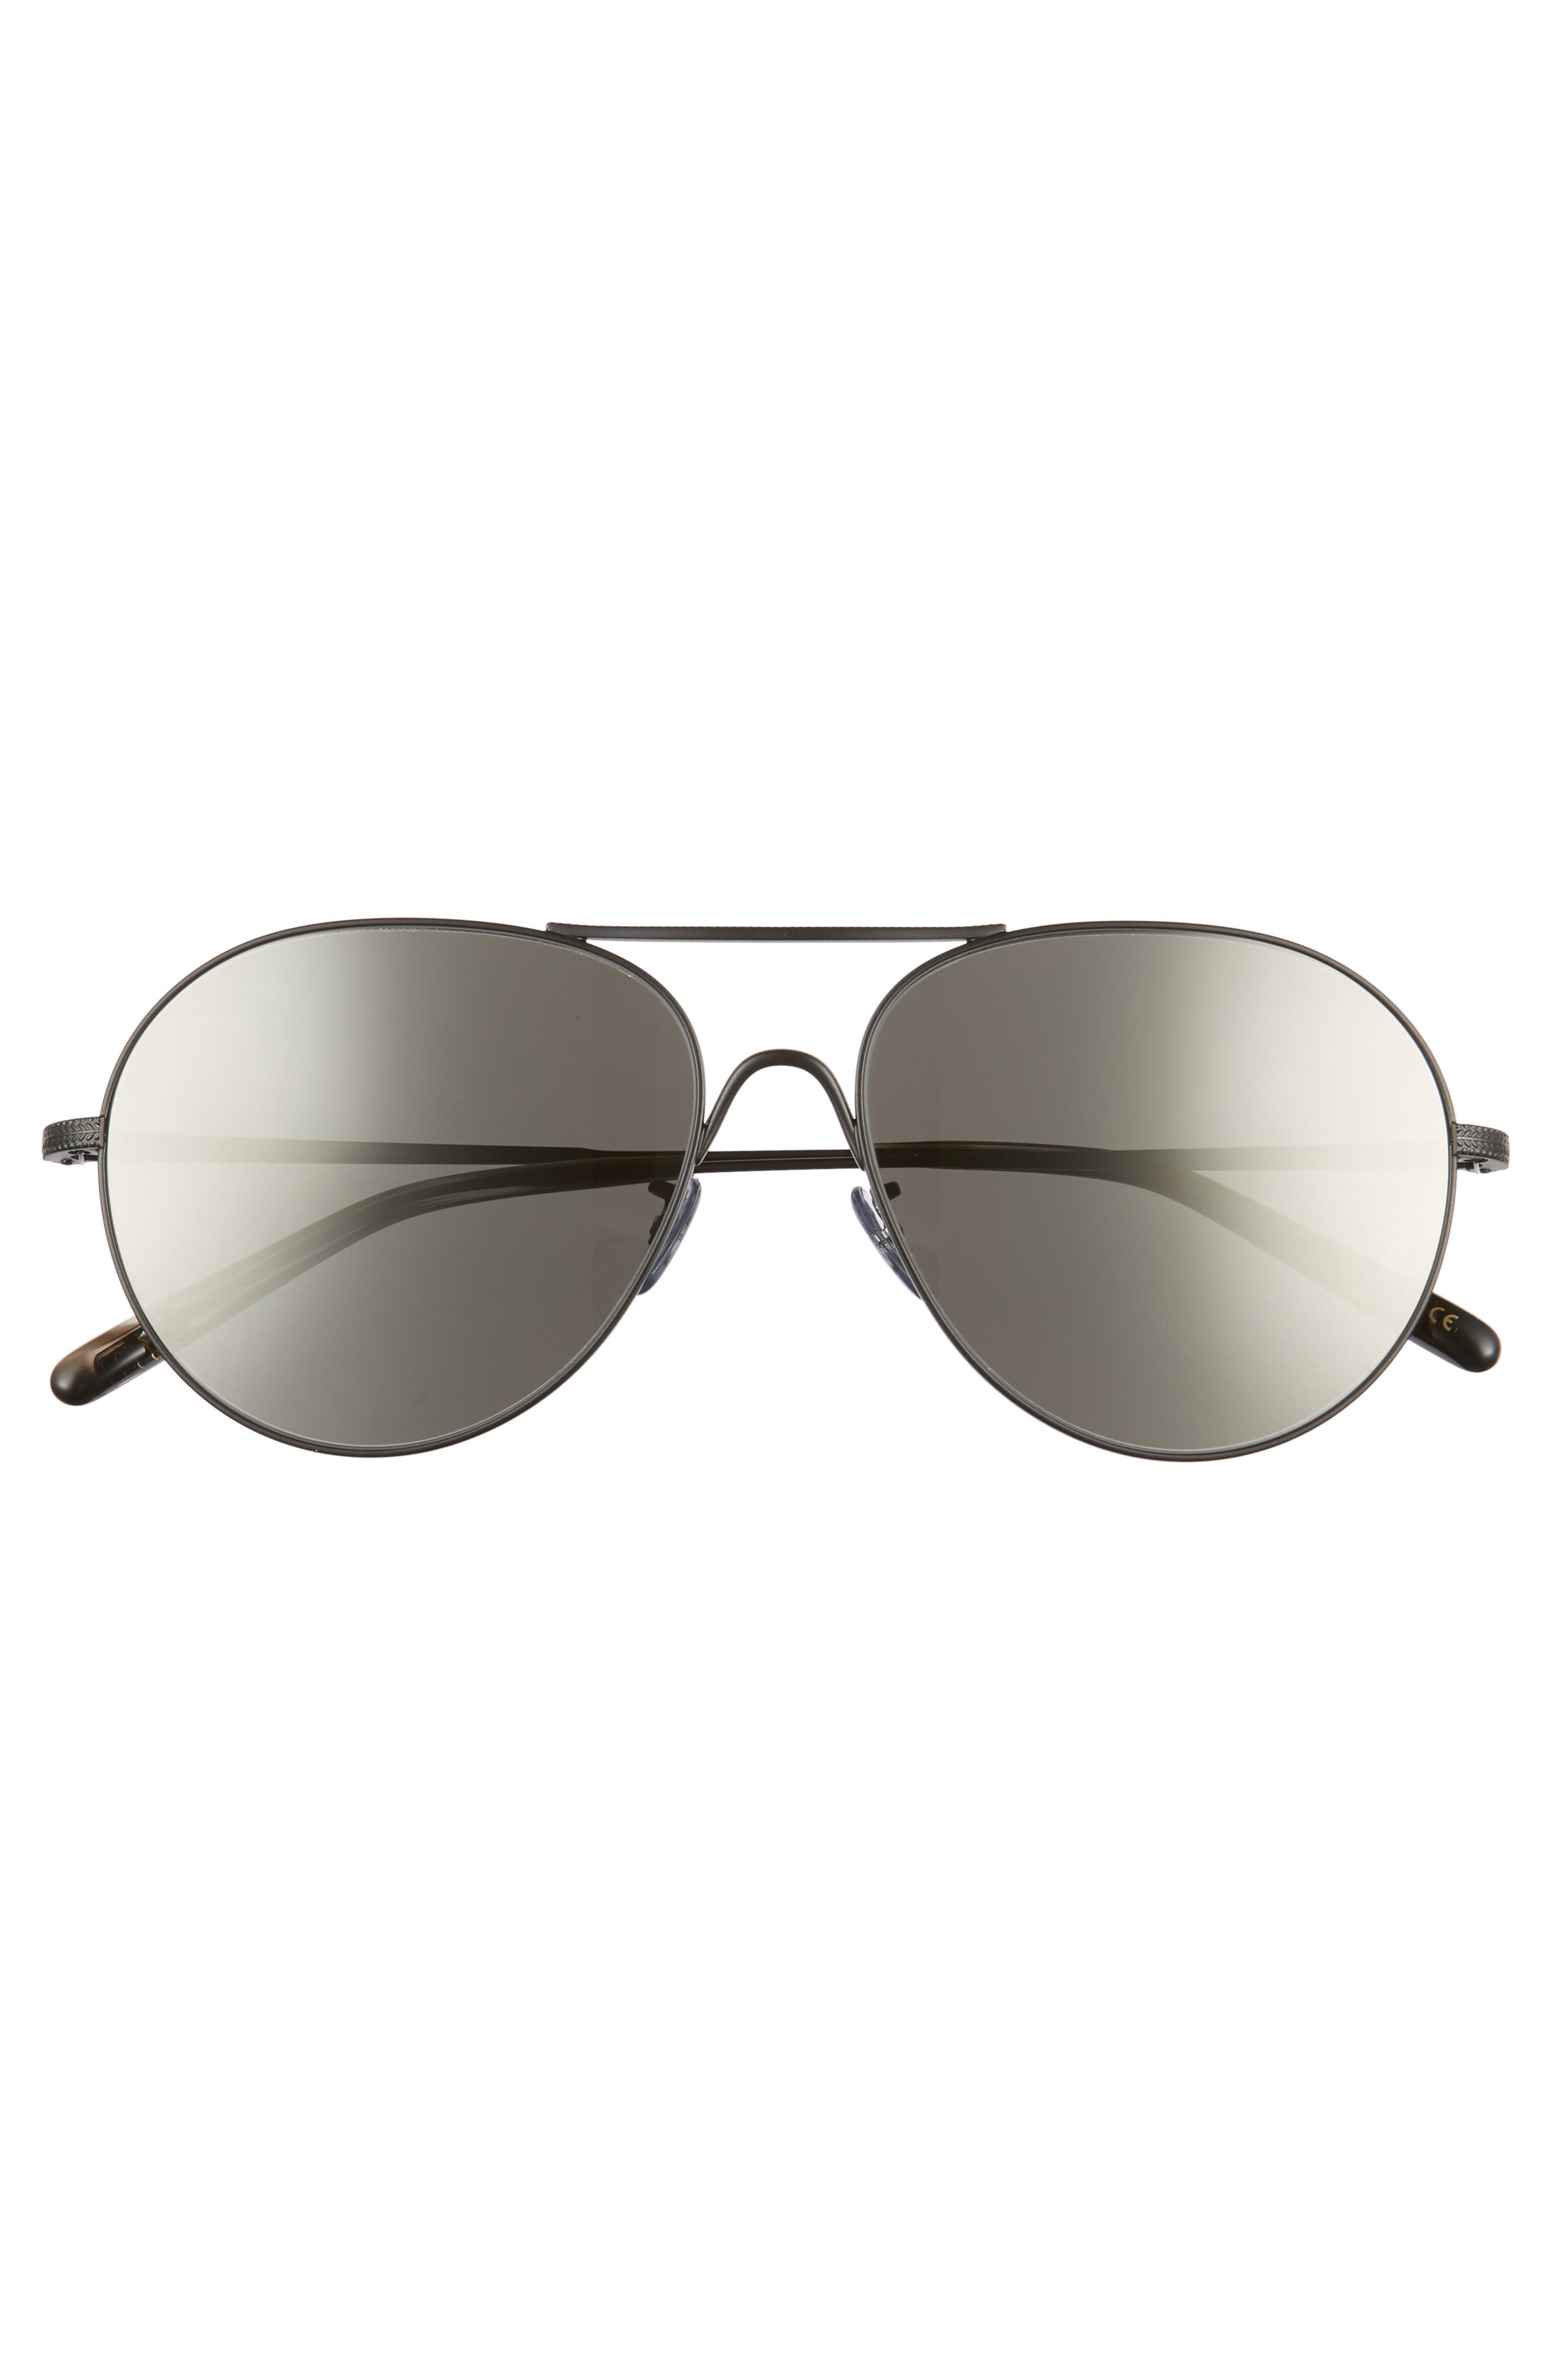 Rockmore 58mm Aviator Sunglasses,                             Alternate thumbnail 3, color,                             GREY